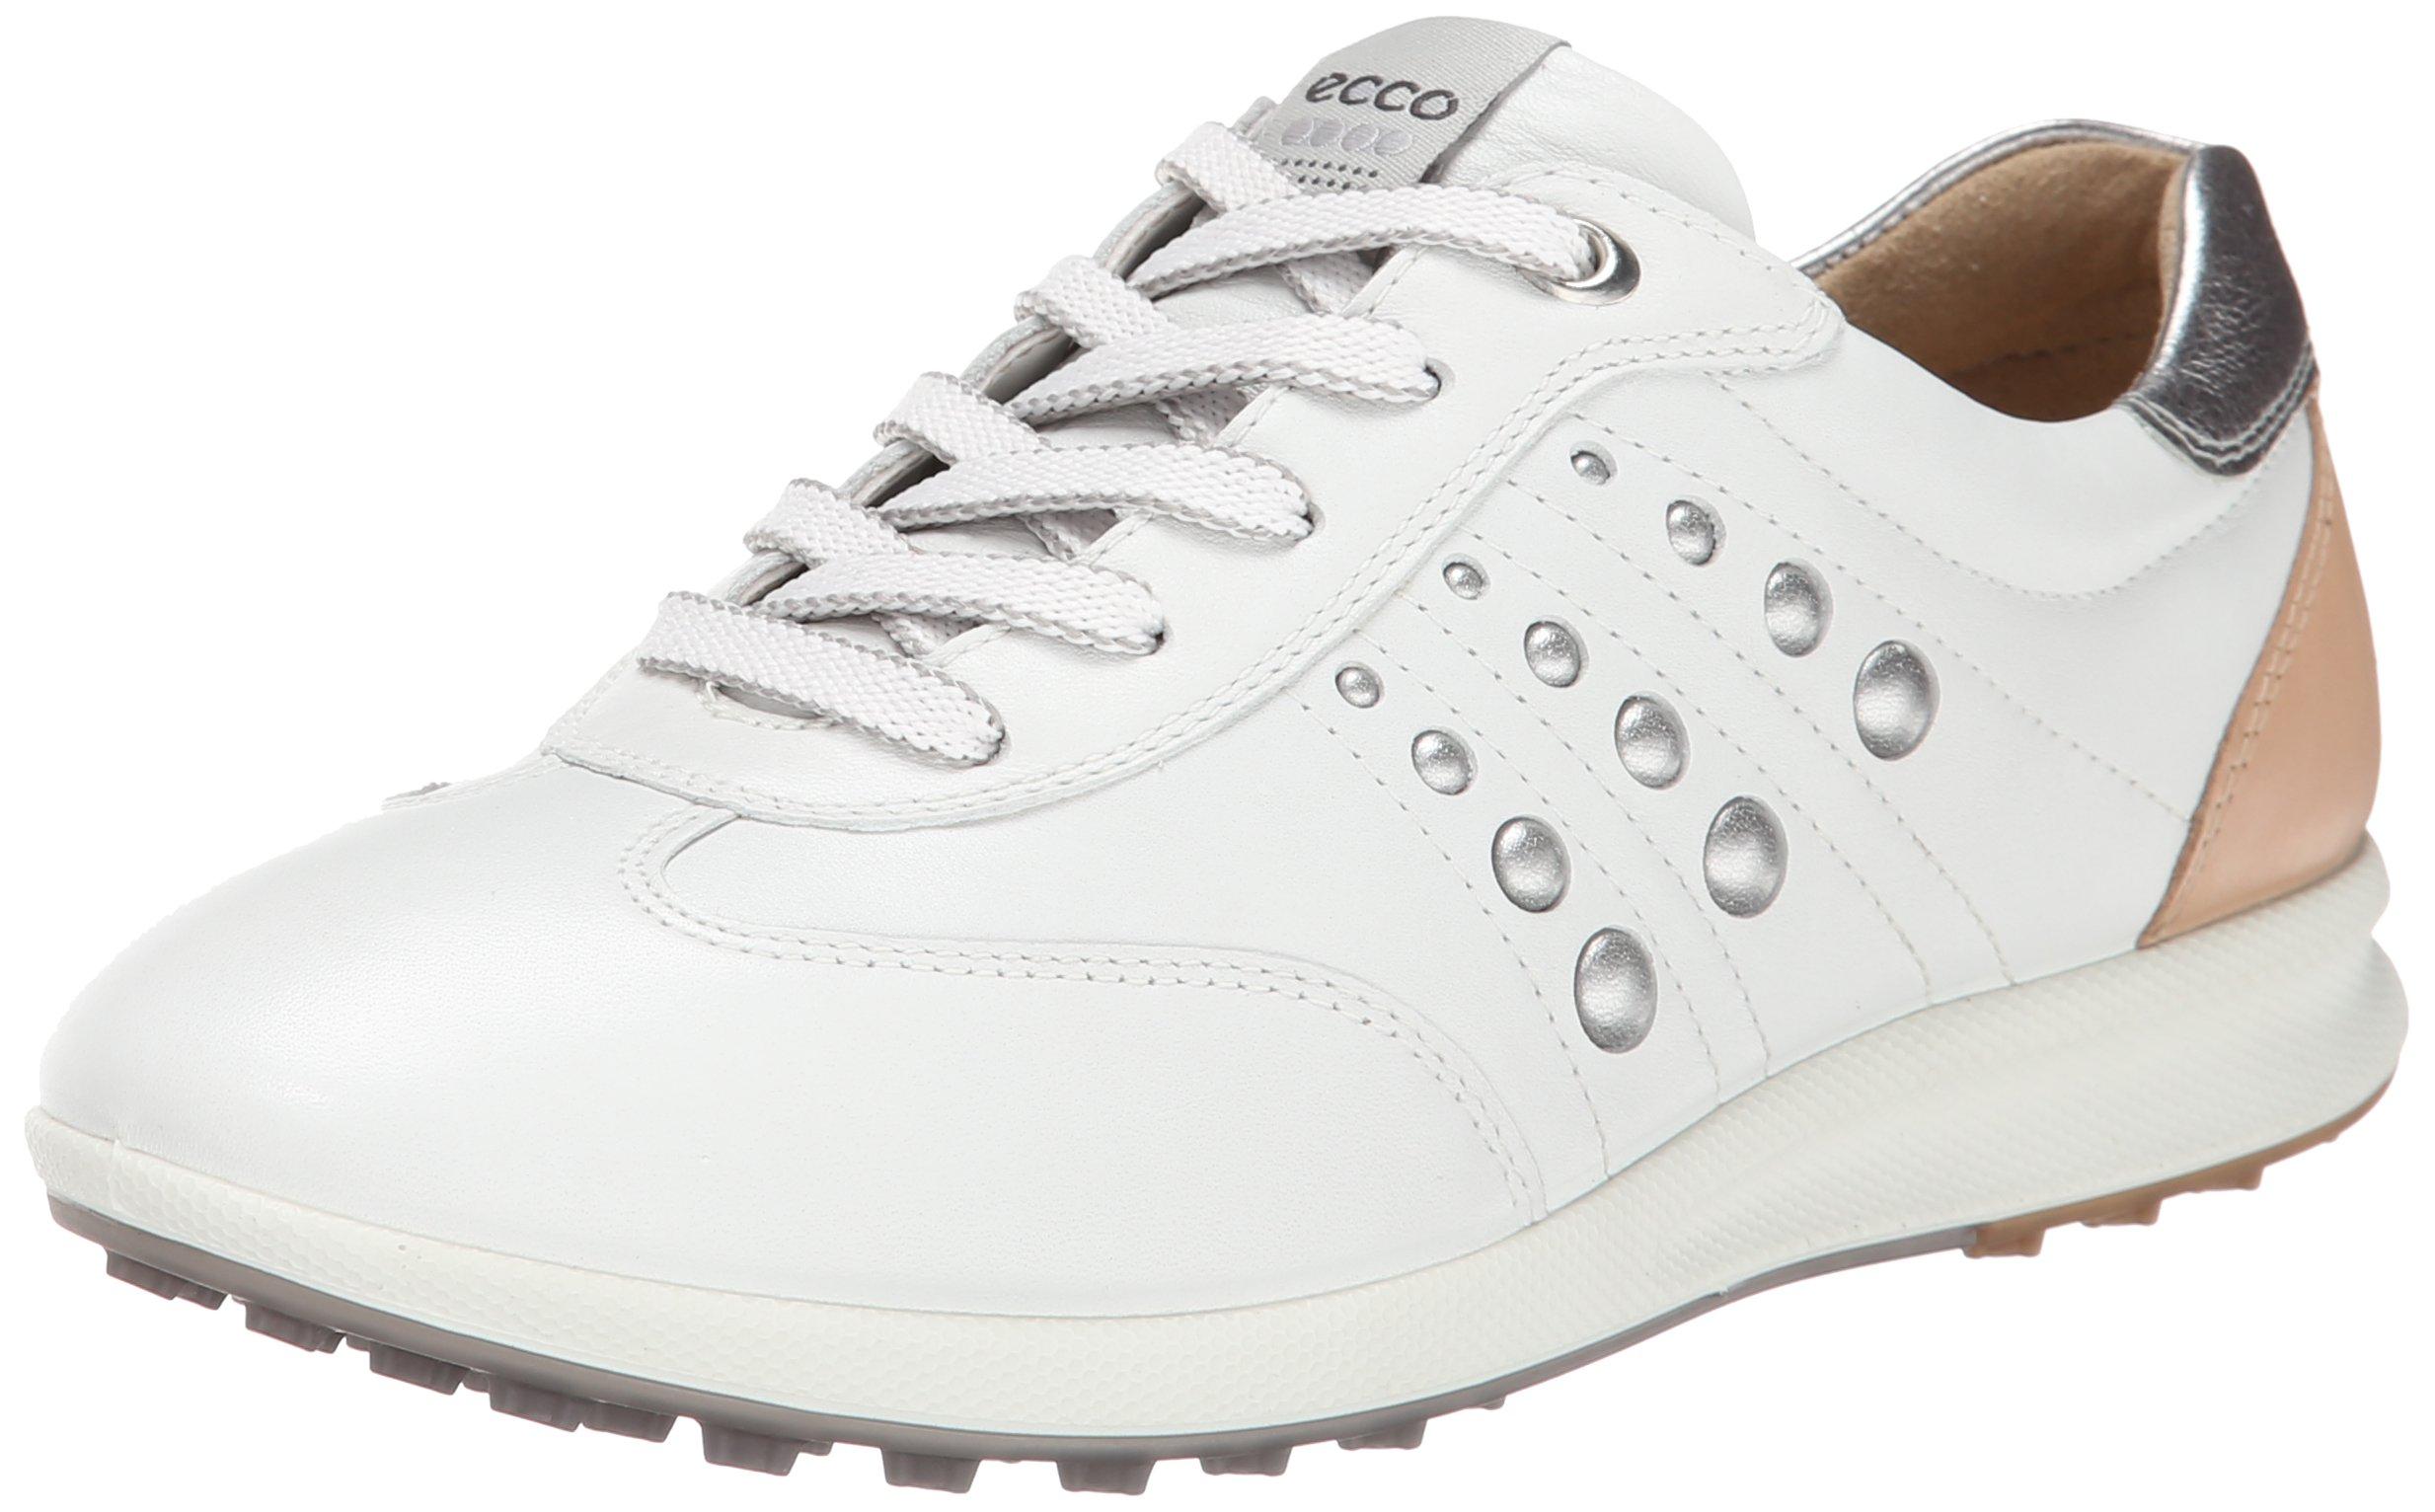 ECCO Women's Street EVO One Luxe Golf Shoe,White/Mineral,40 EU/9-9.5 M US